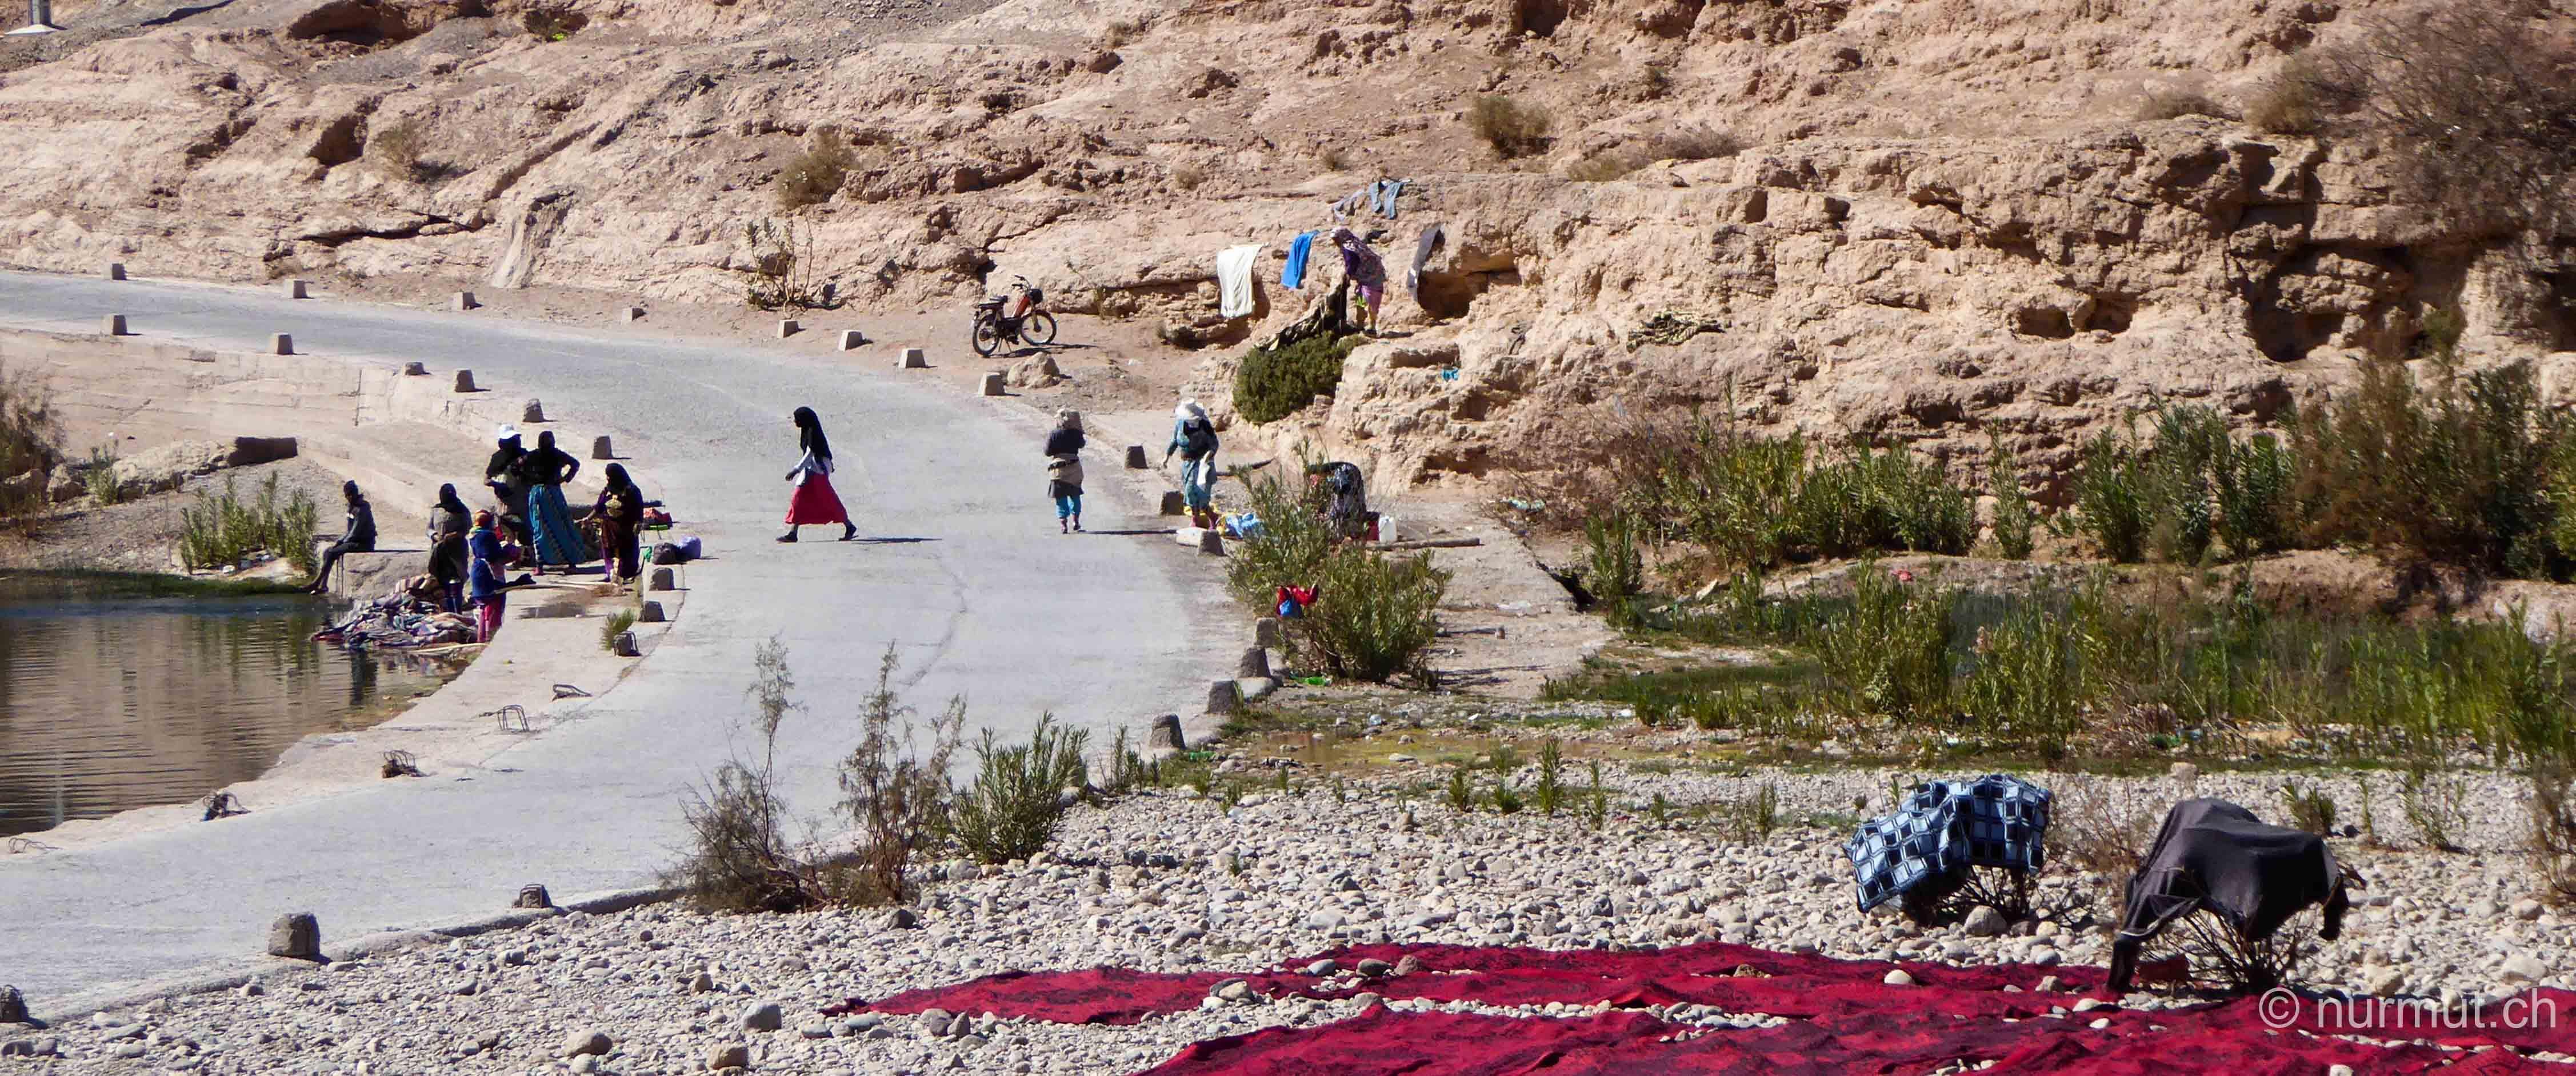 im winter in marokko-nurmut-berberteppich-berber-tata-marokko